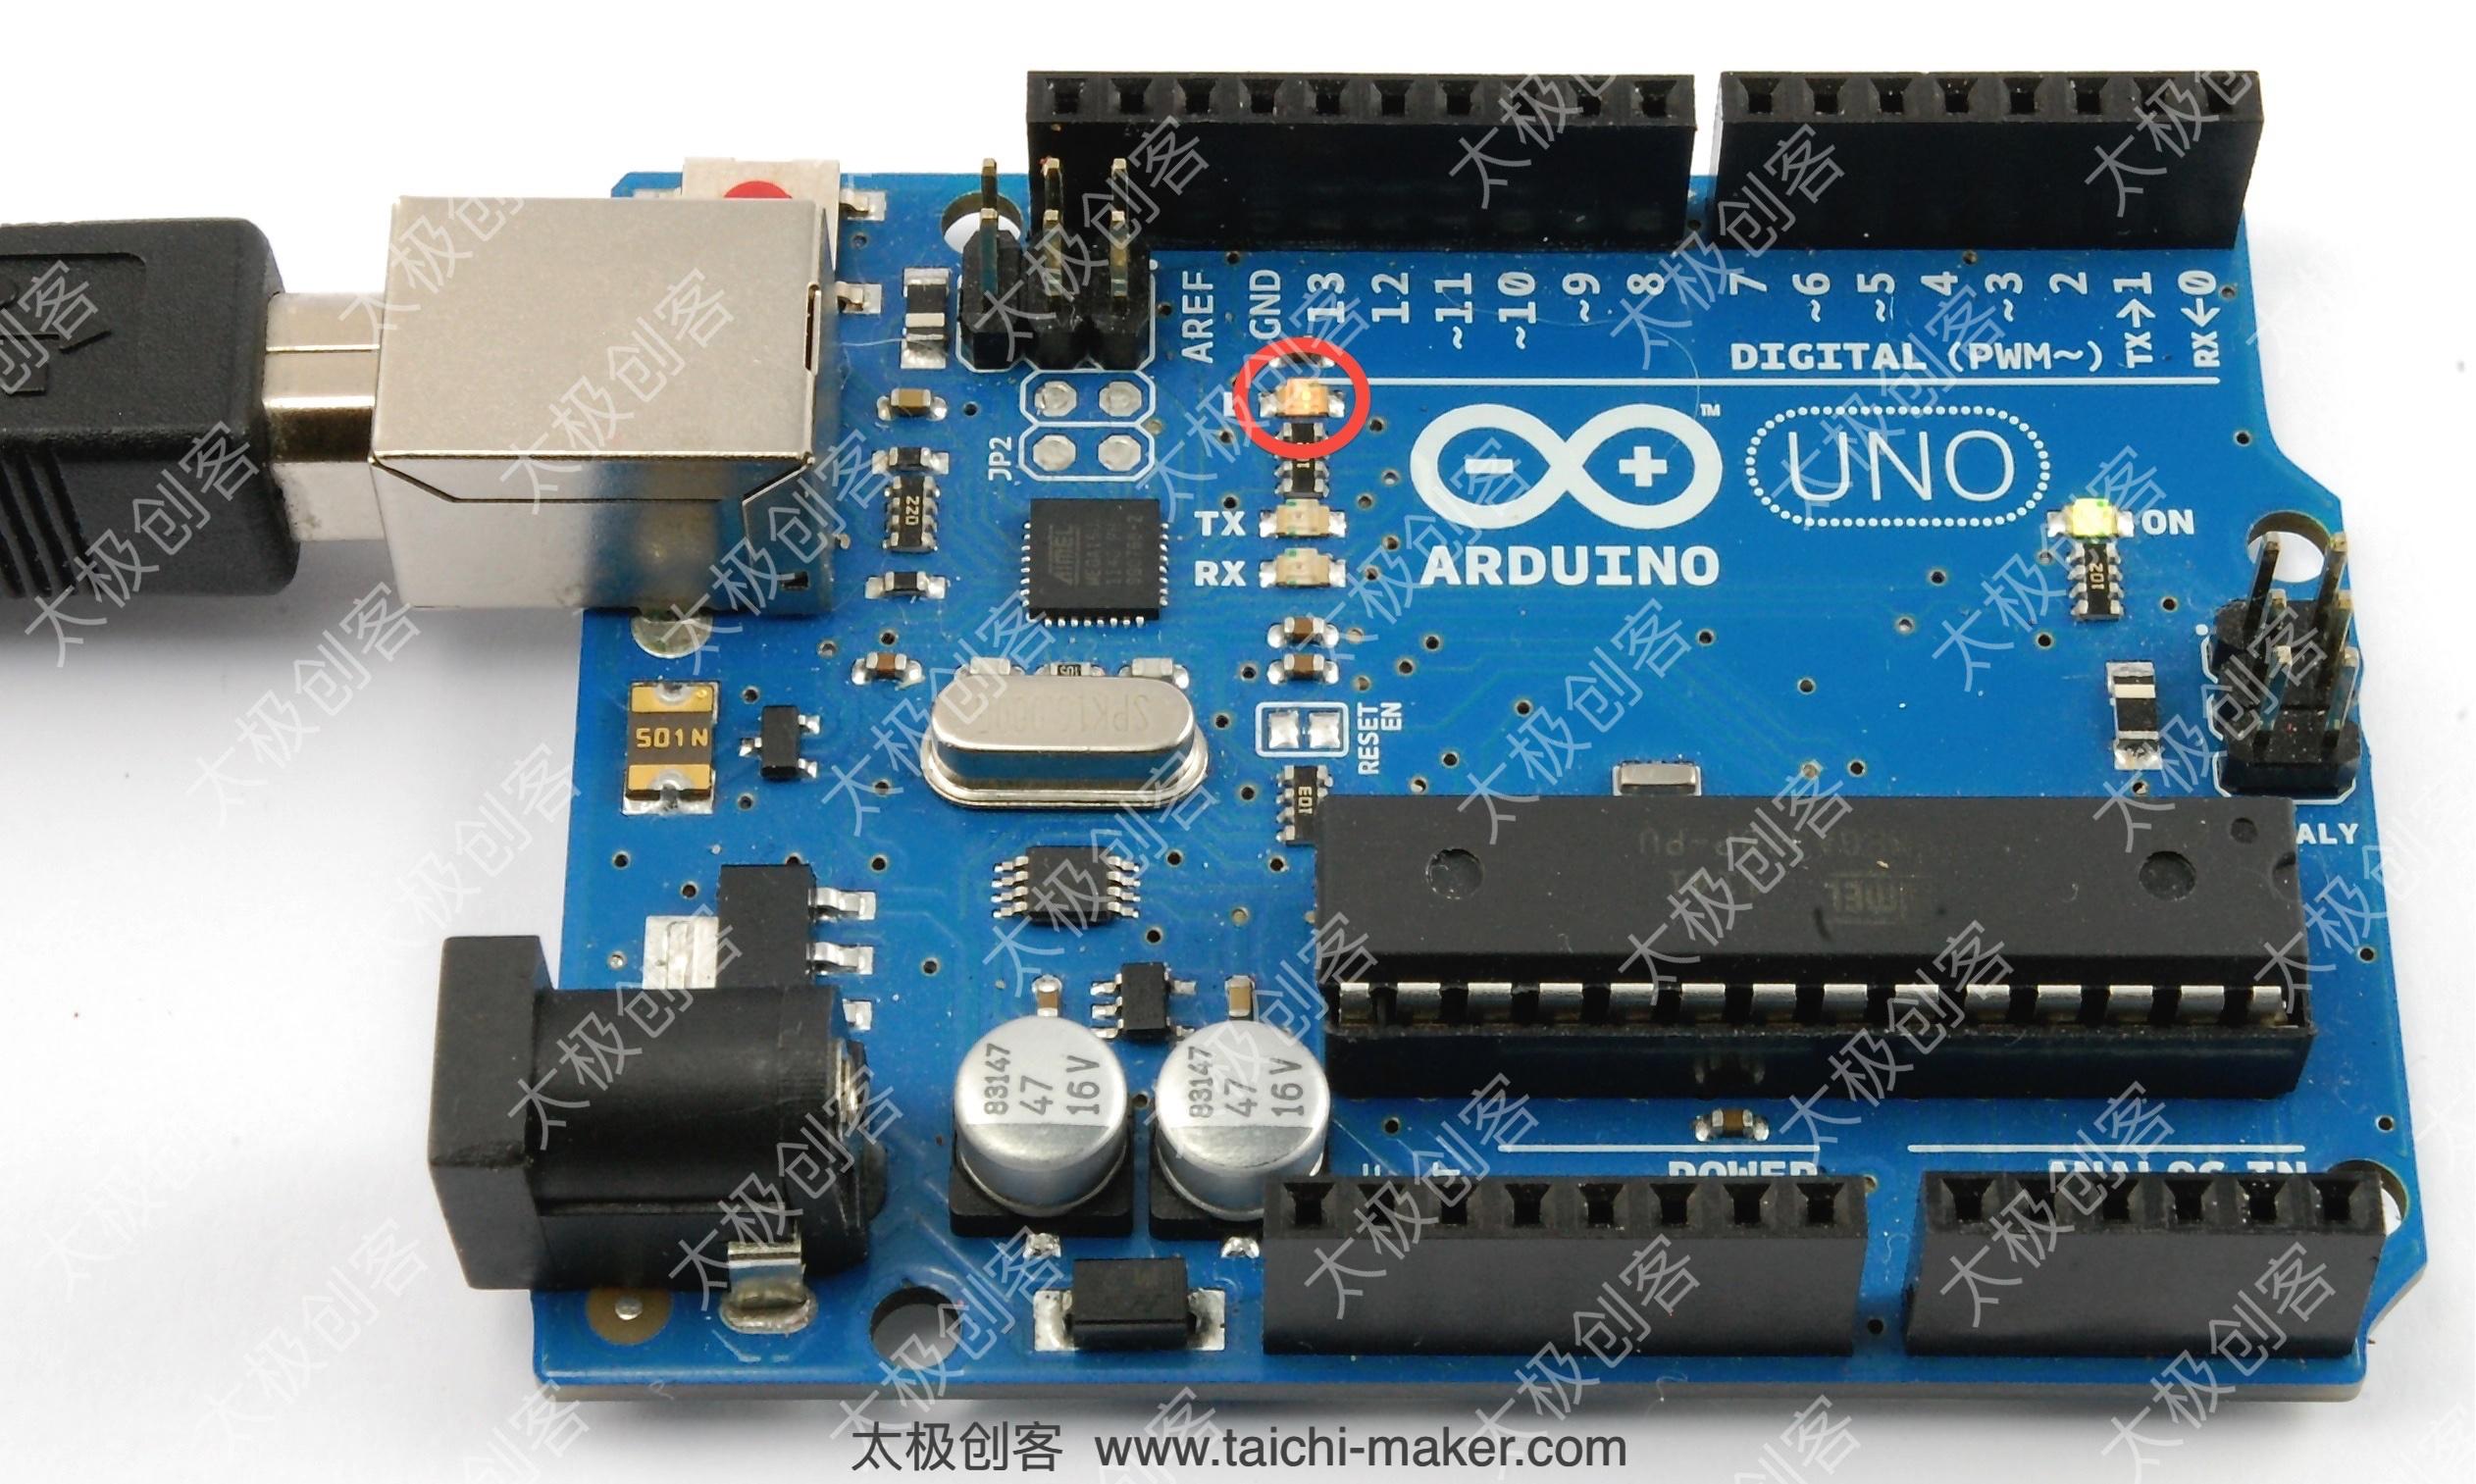 arduino-uno LED 被标注